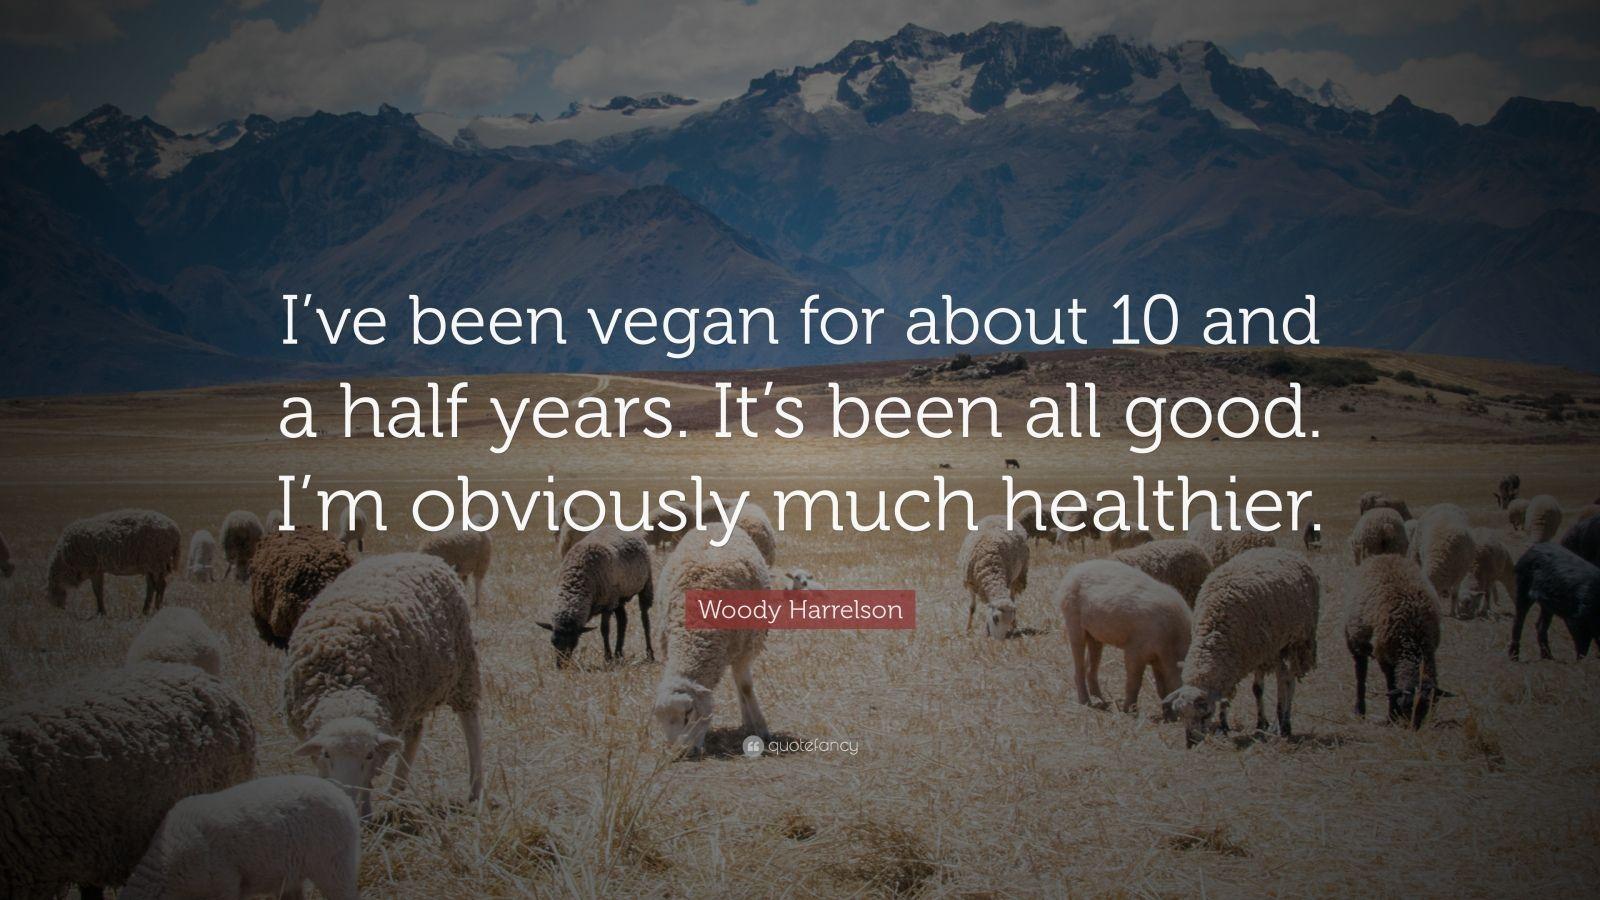 Vegan Quotes Wallpaper Quotes About Veganism 52 Wallpapers Quotefancy